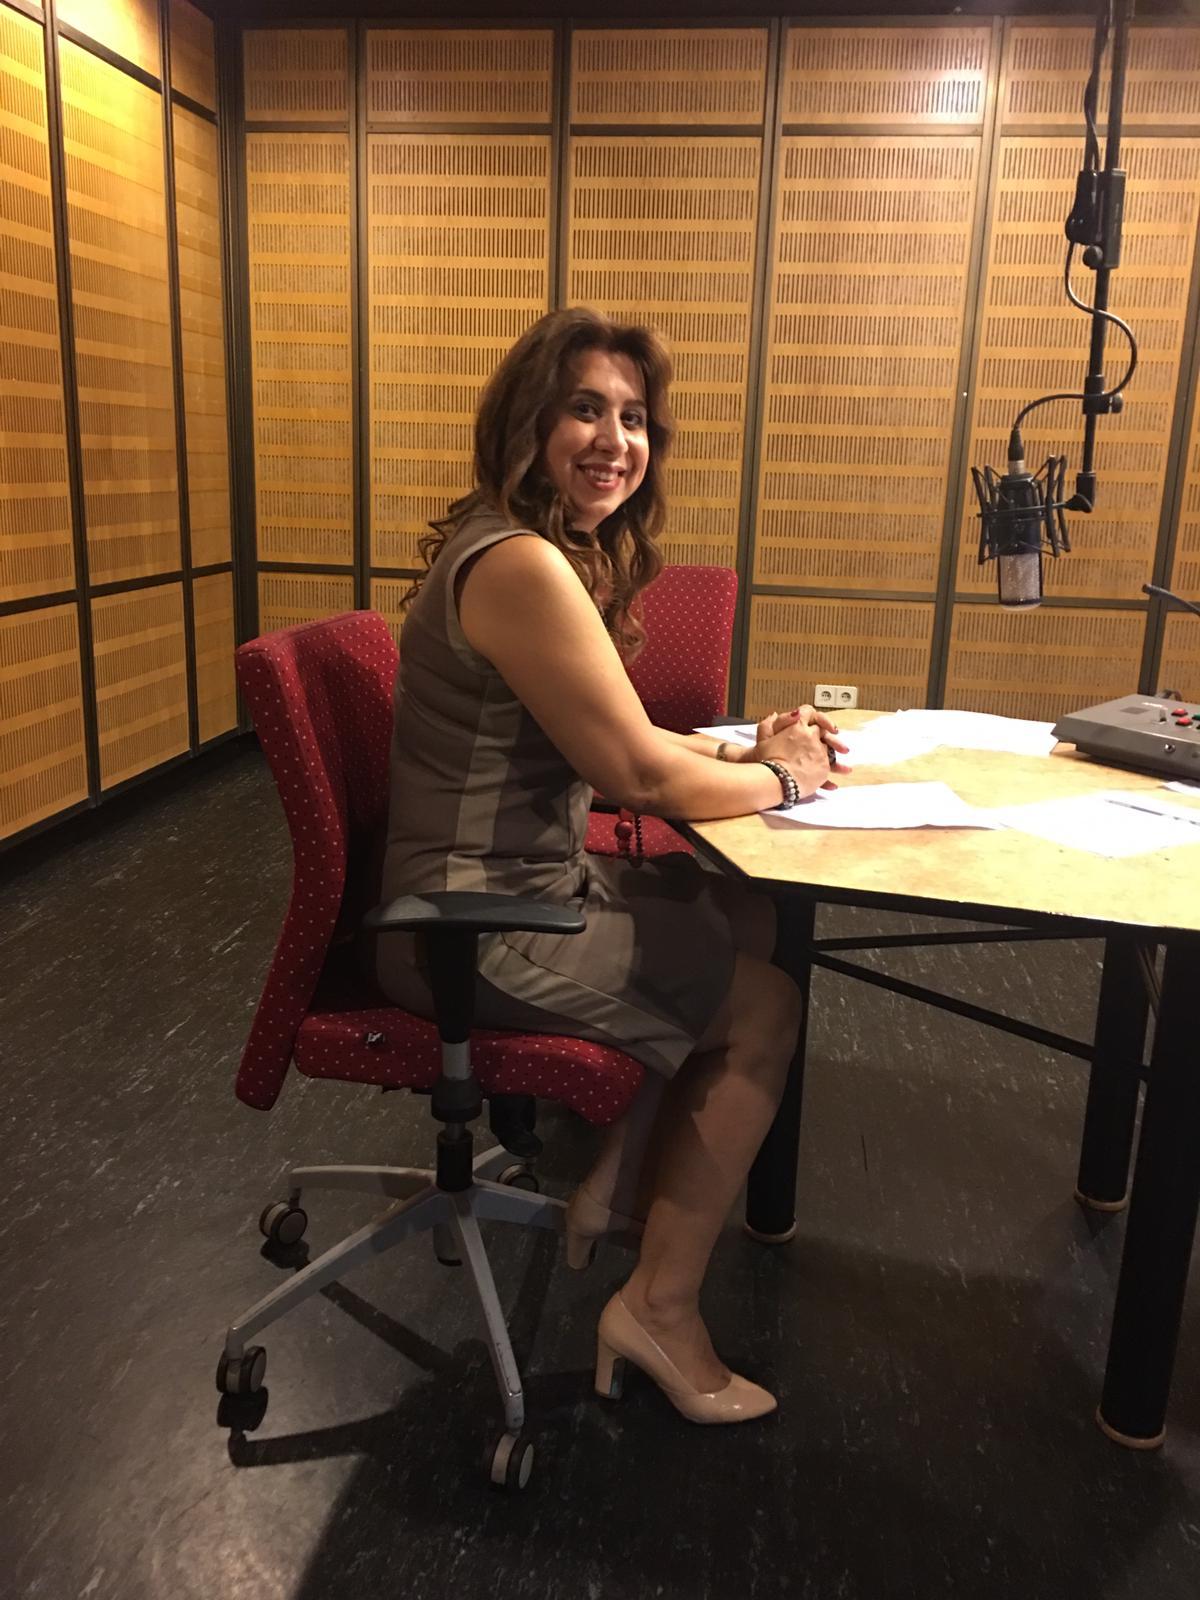 Ankara kadın doğum uzmanı doçent doktor melahat atsever15